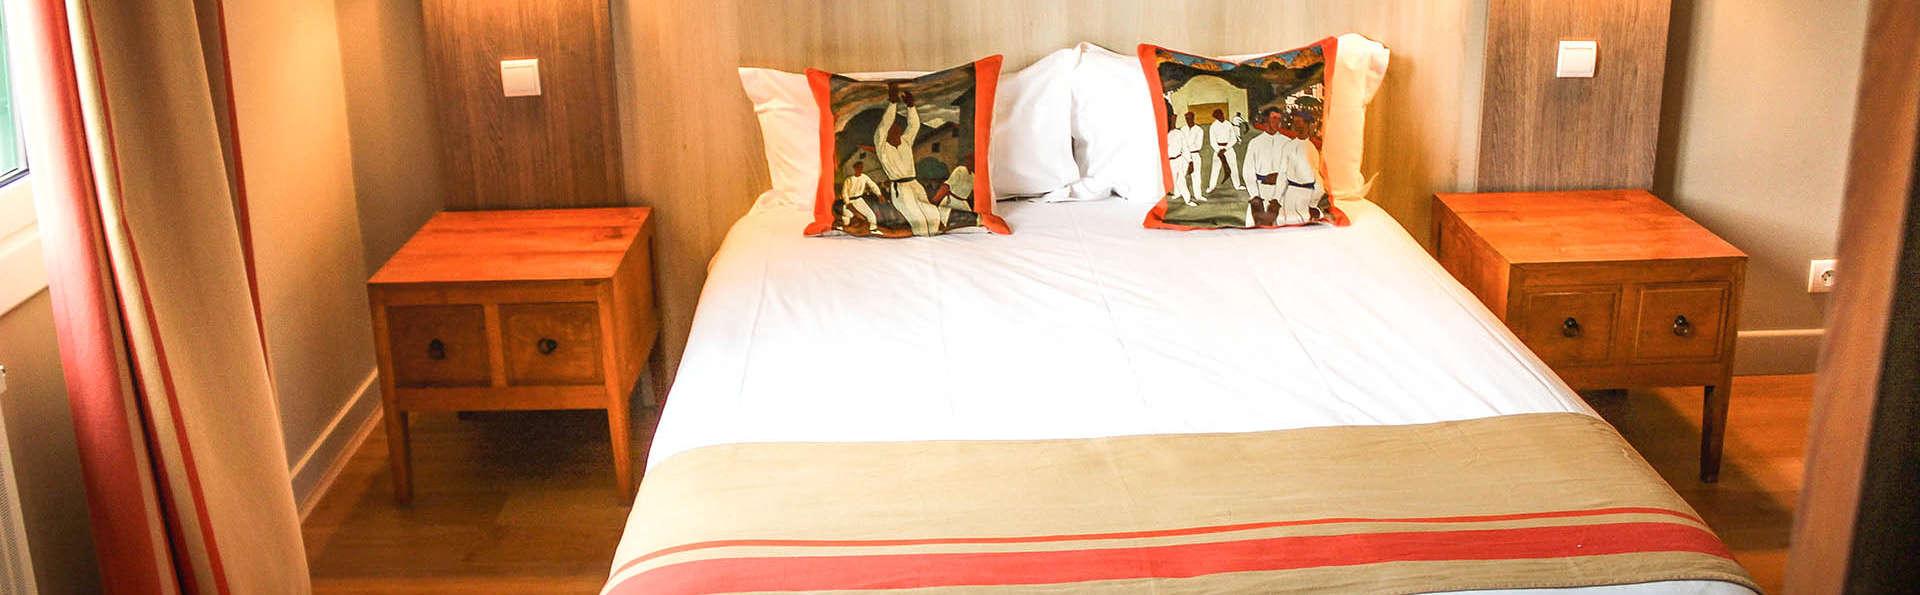 Hotel Agur Deneri  - EDIT_ROOM_06.jpg